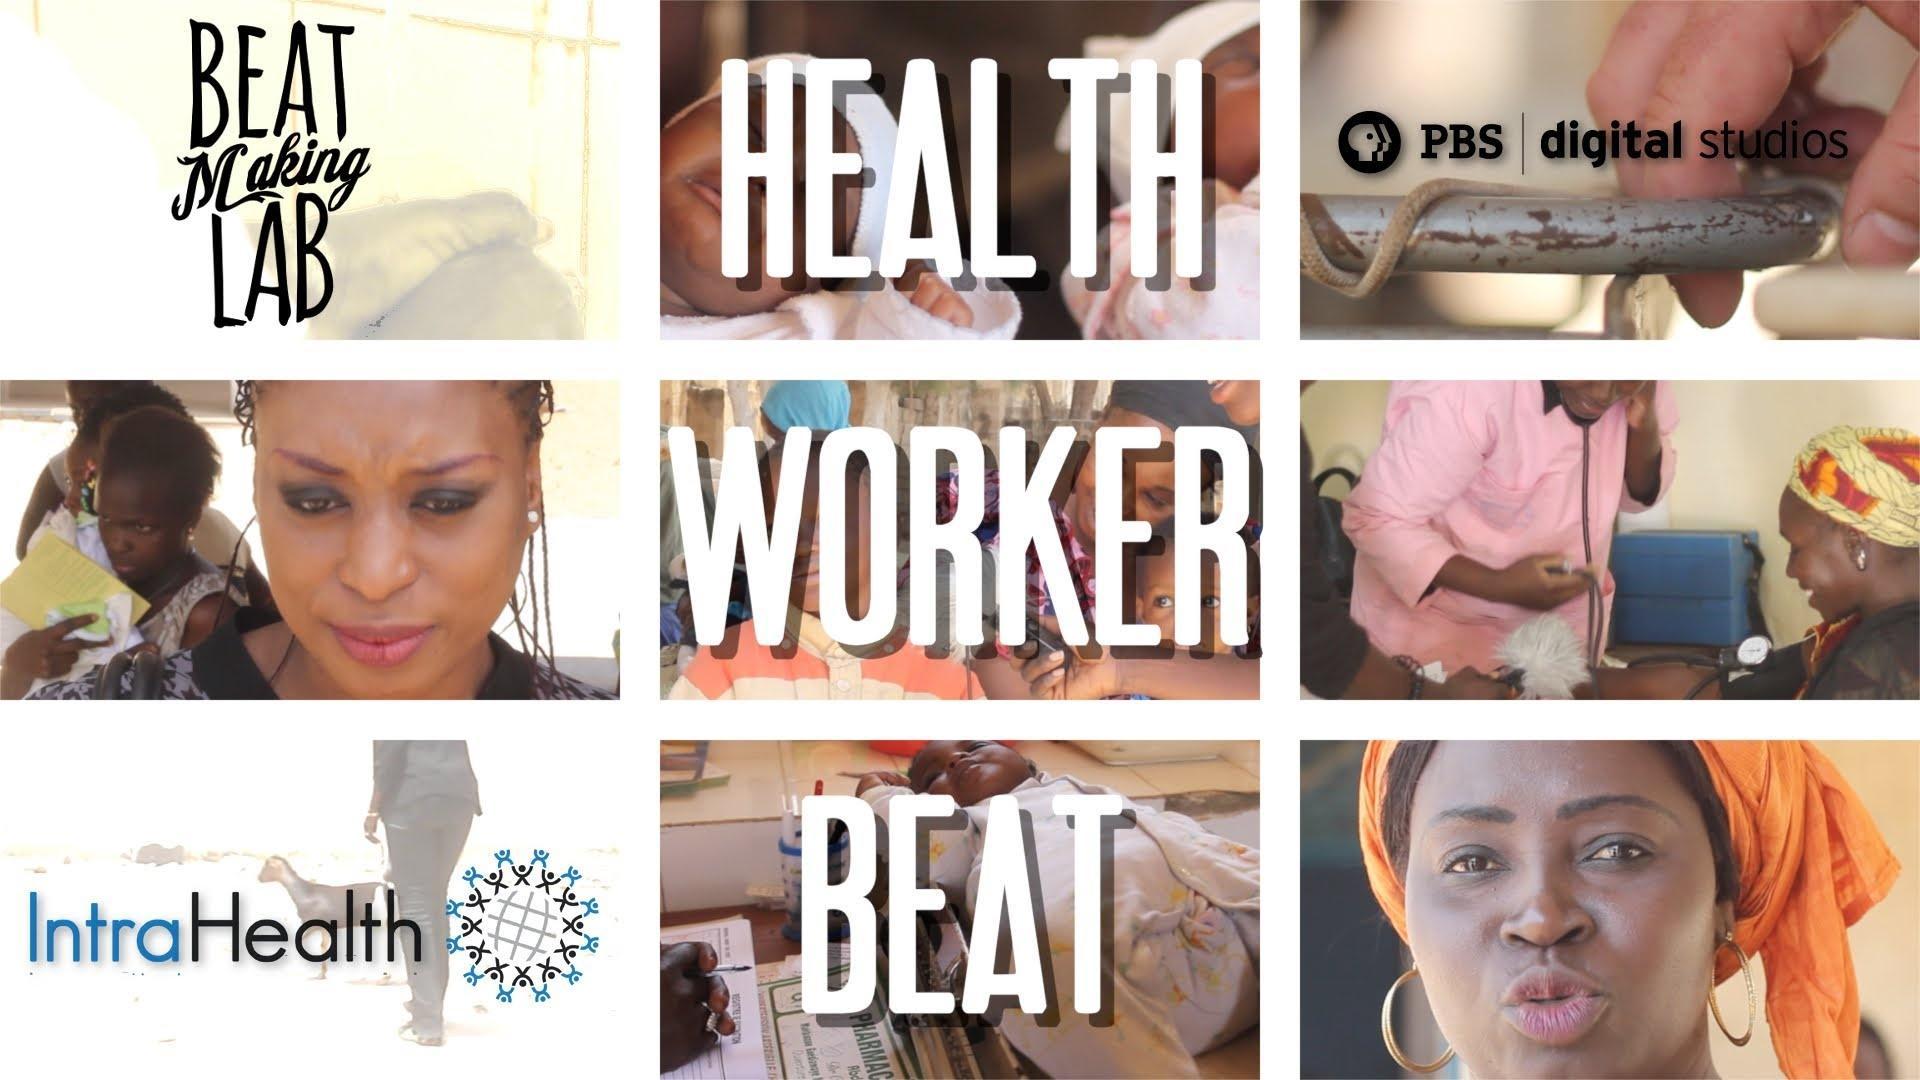 Health Worker Beat  image